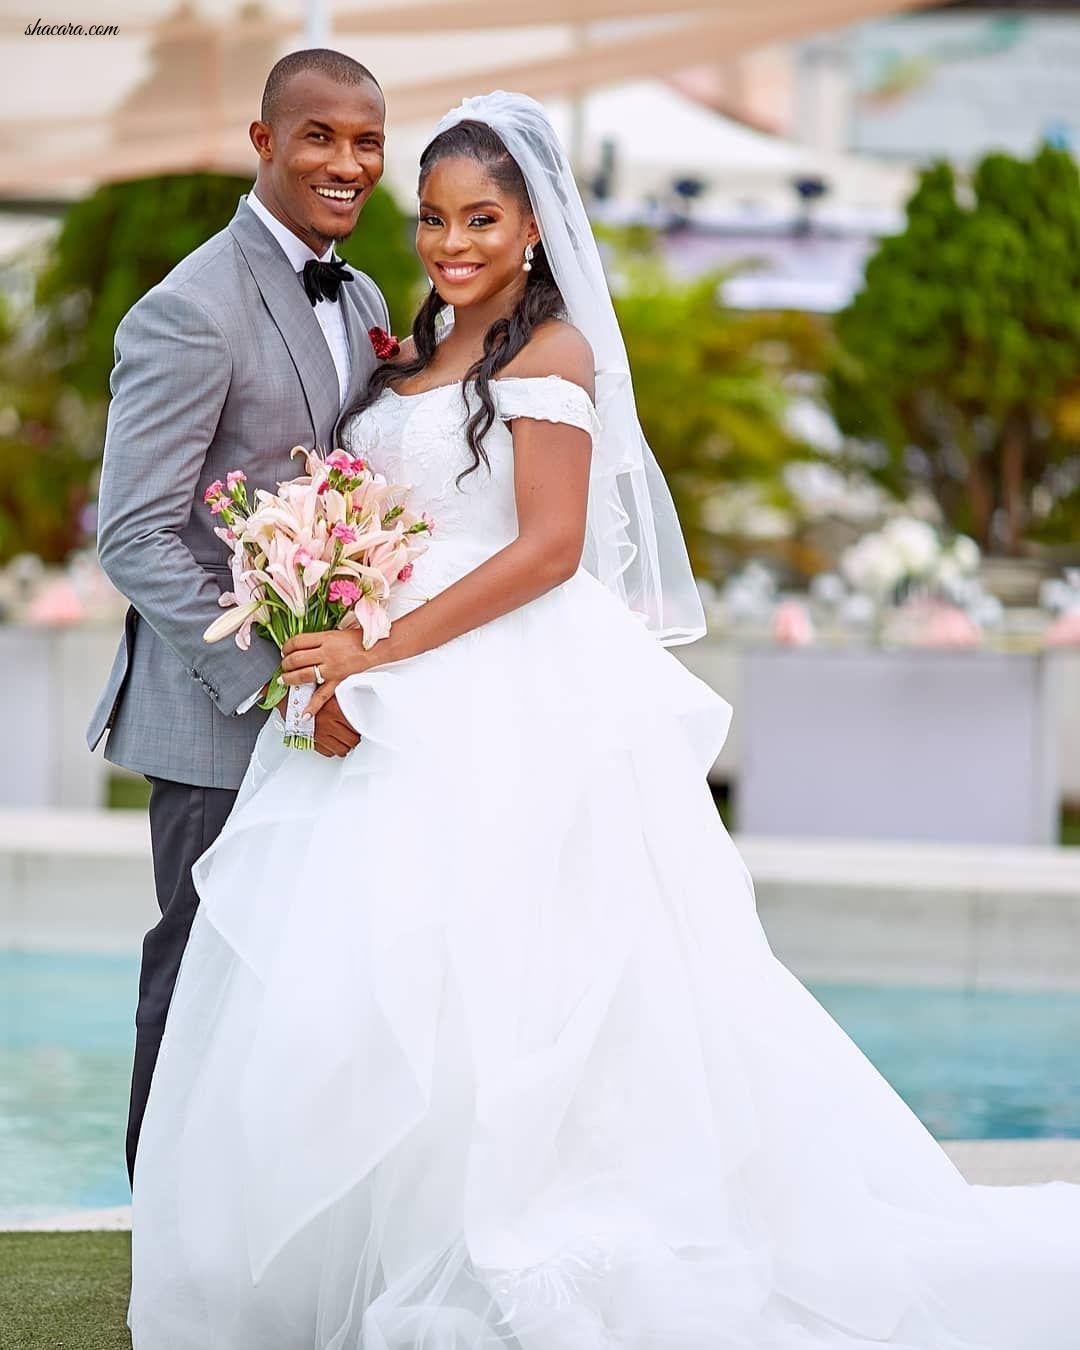 These Unseen White Wedding Photos Of Gideon Okeke And